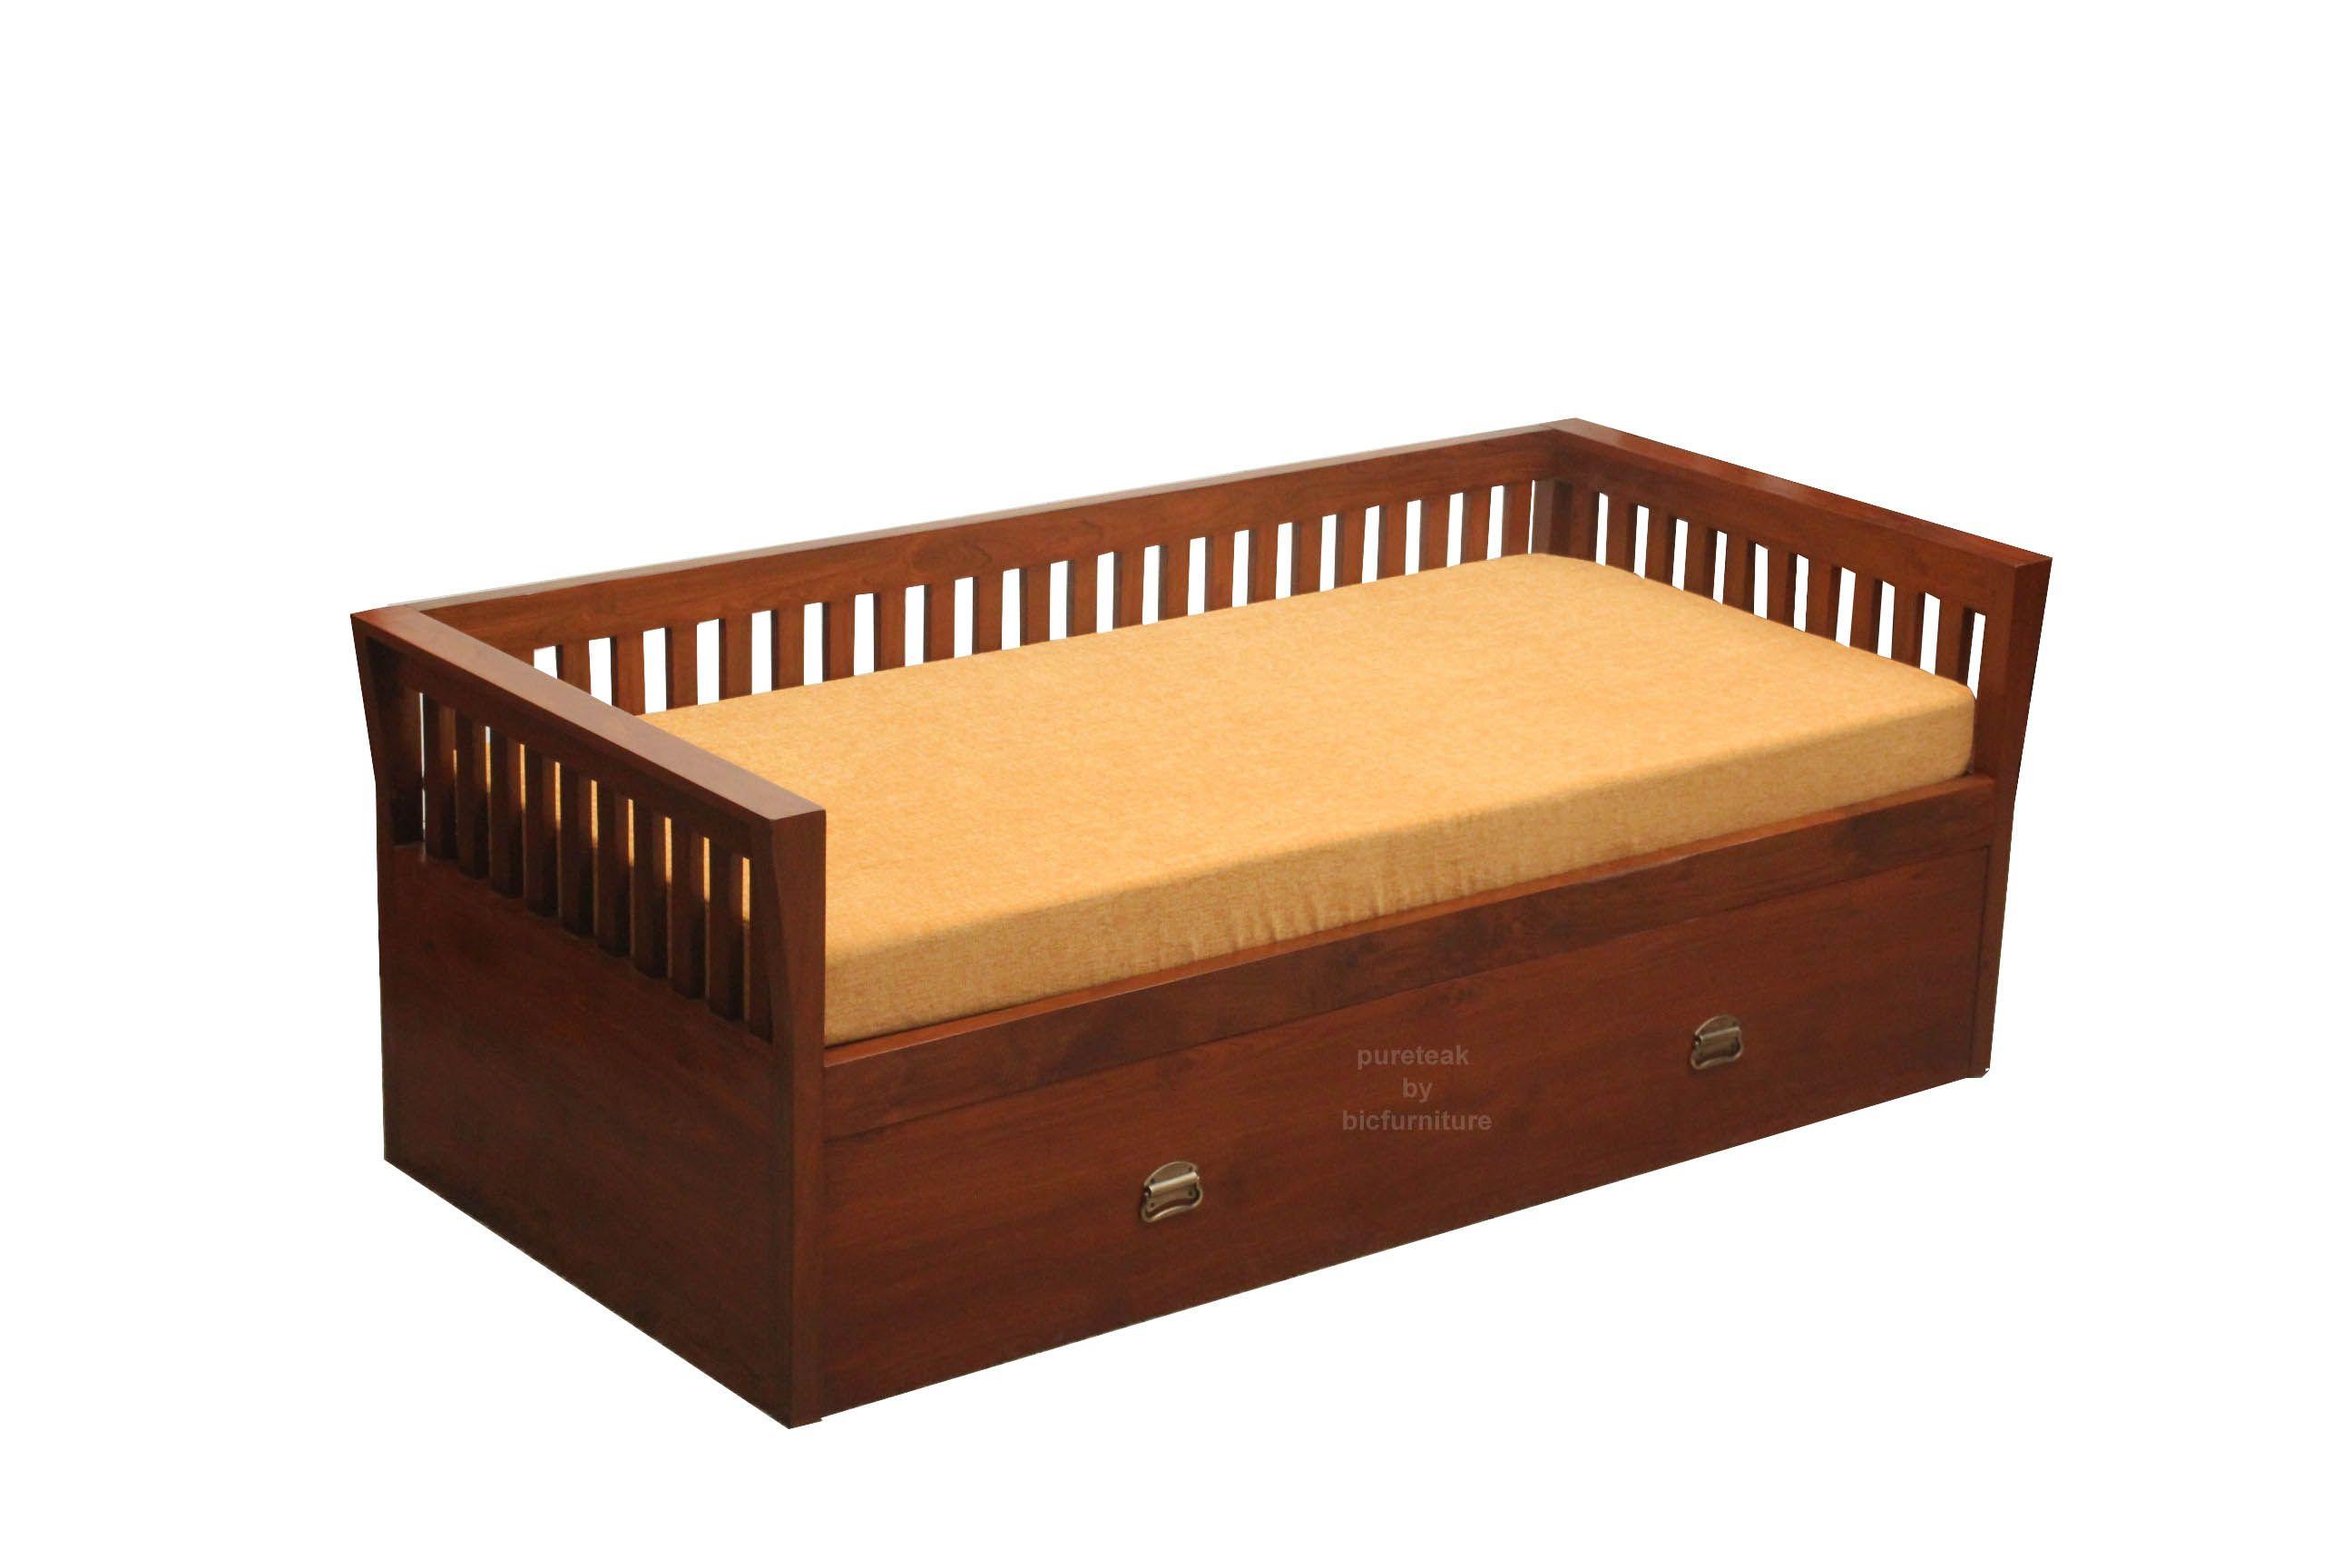 Storage sofa bed & day bed in teak wood Sofa bed wood